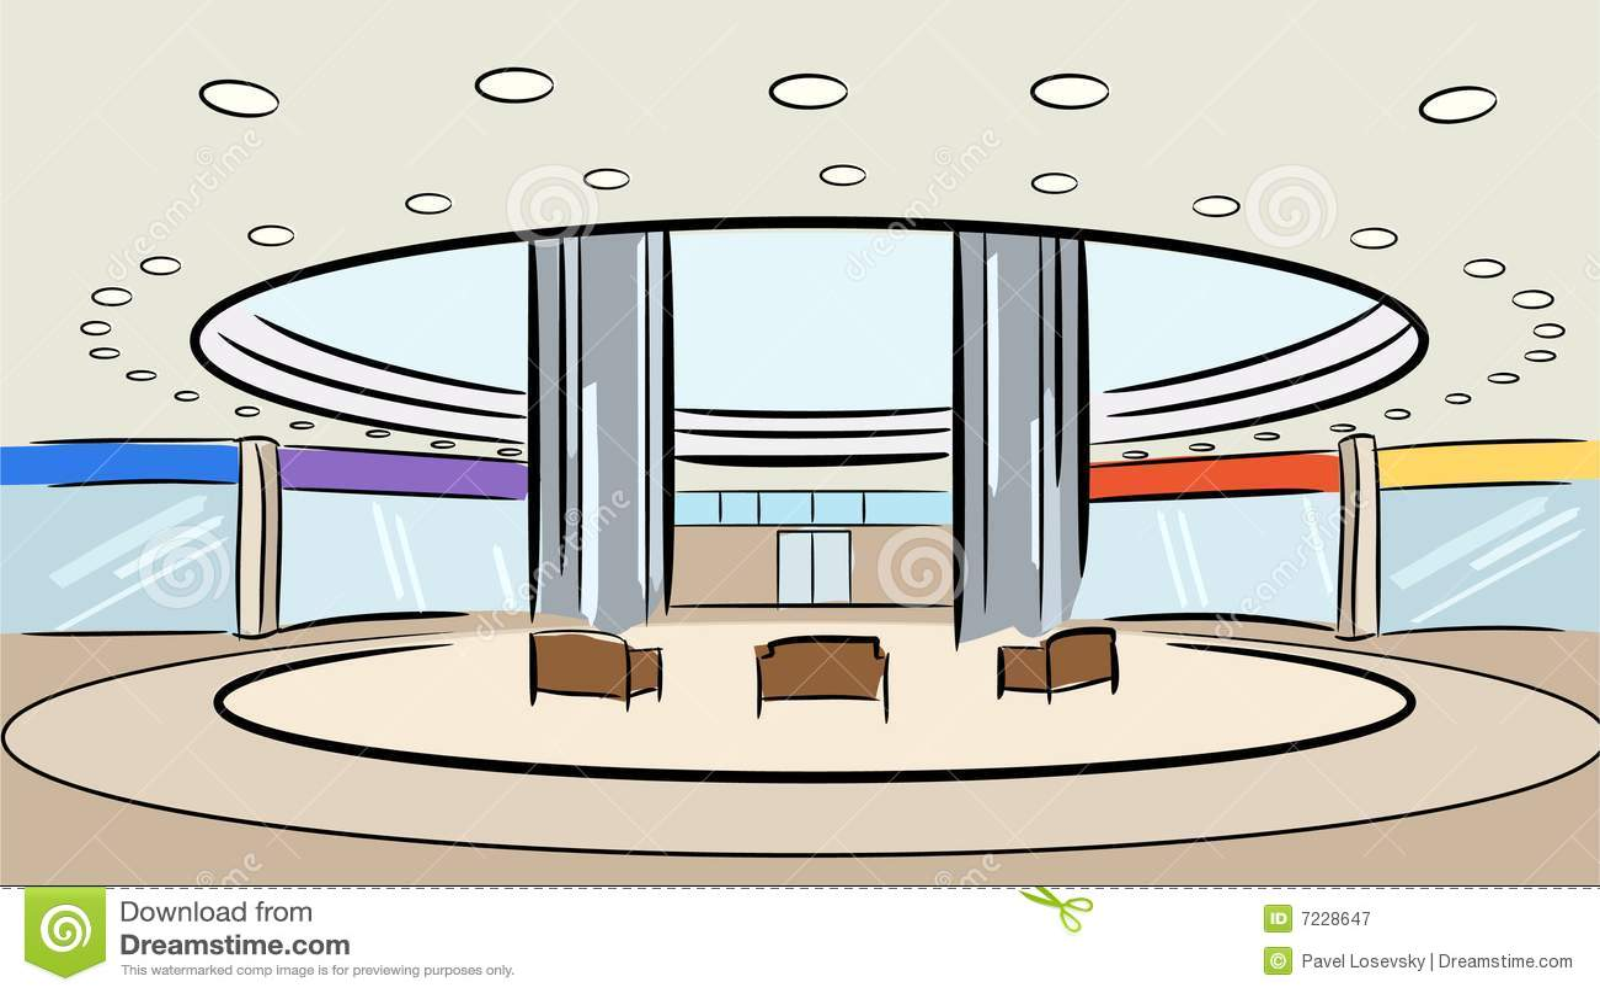 Vetor do interior da loja do mercado